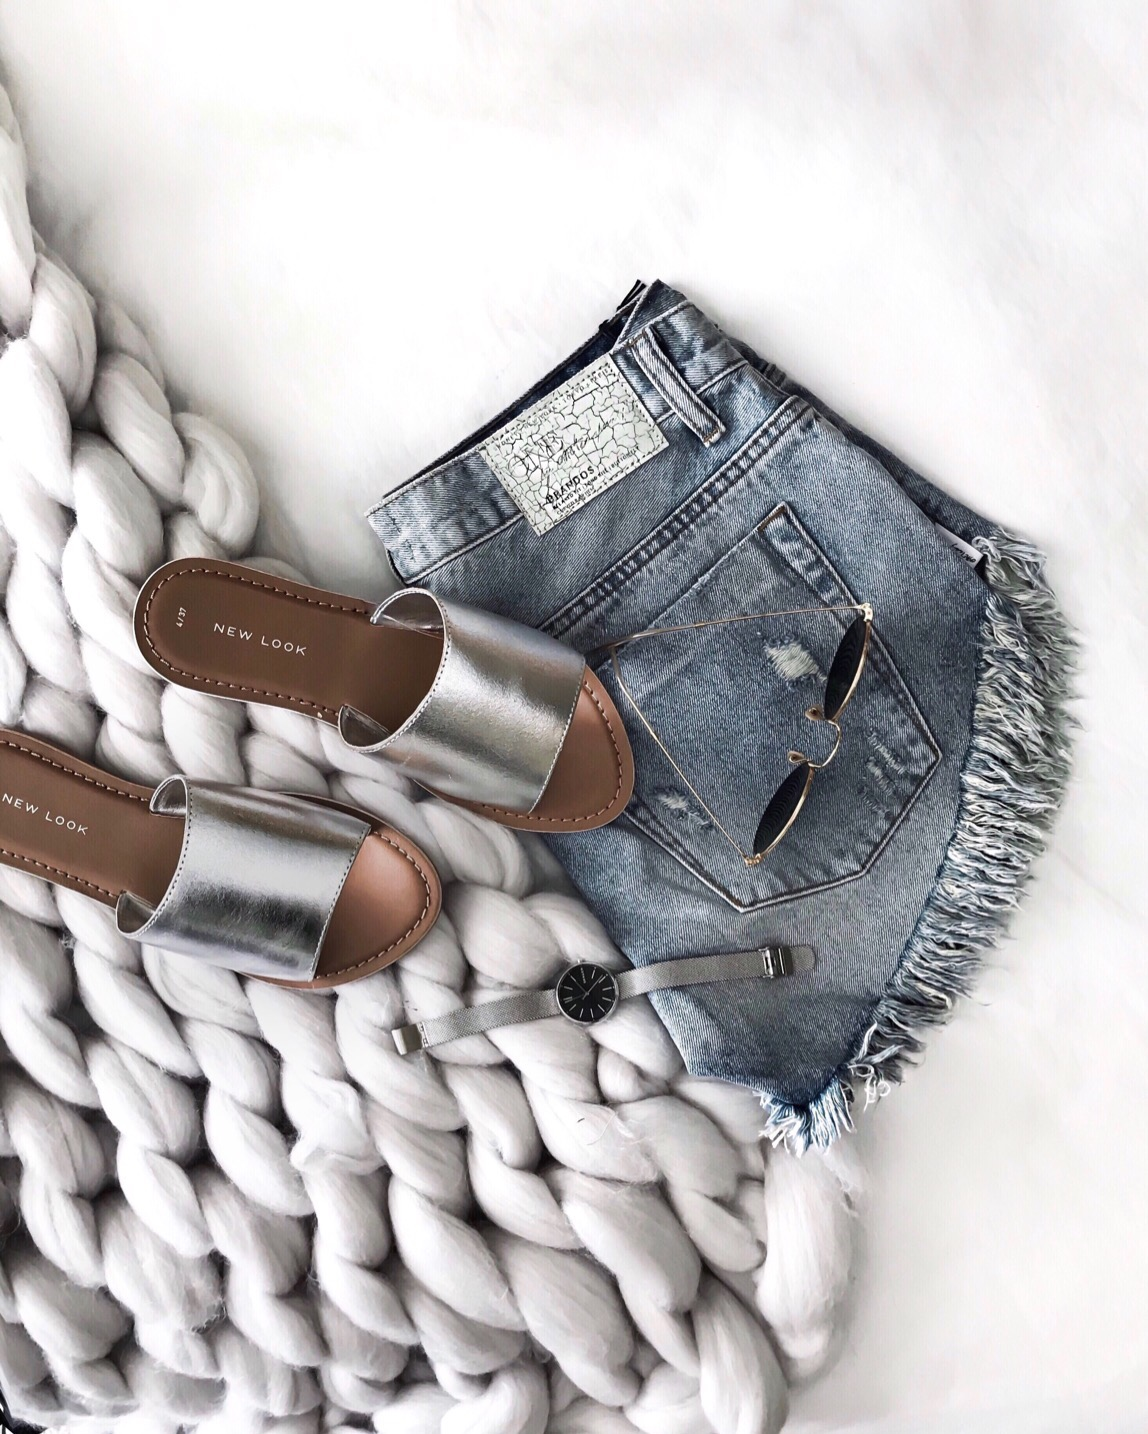 Tiffany Jais Houston fashion and lifestyle blogger   Friday feels + weekend sales  